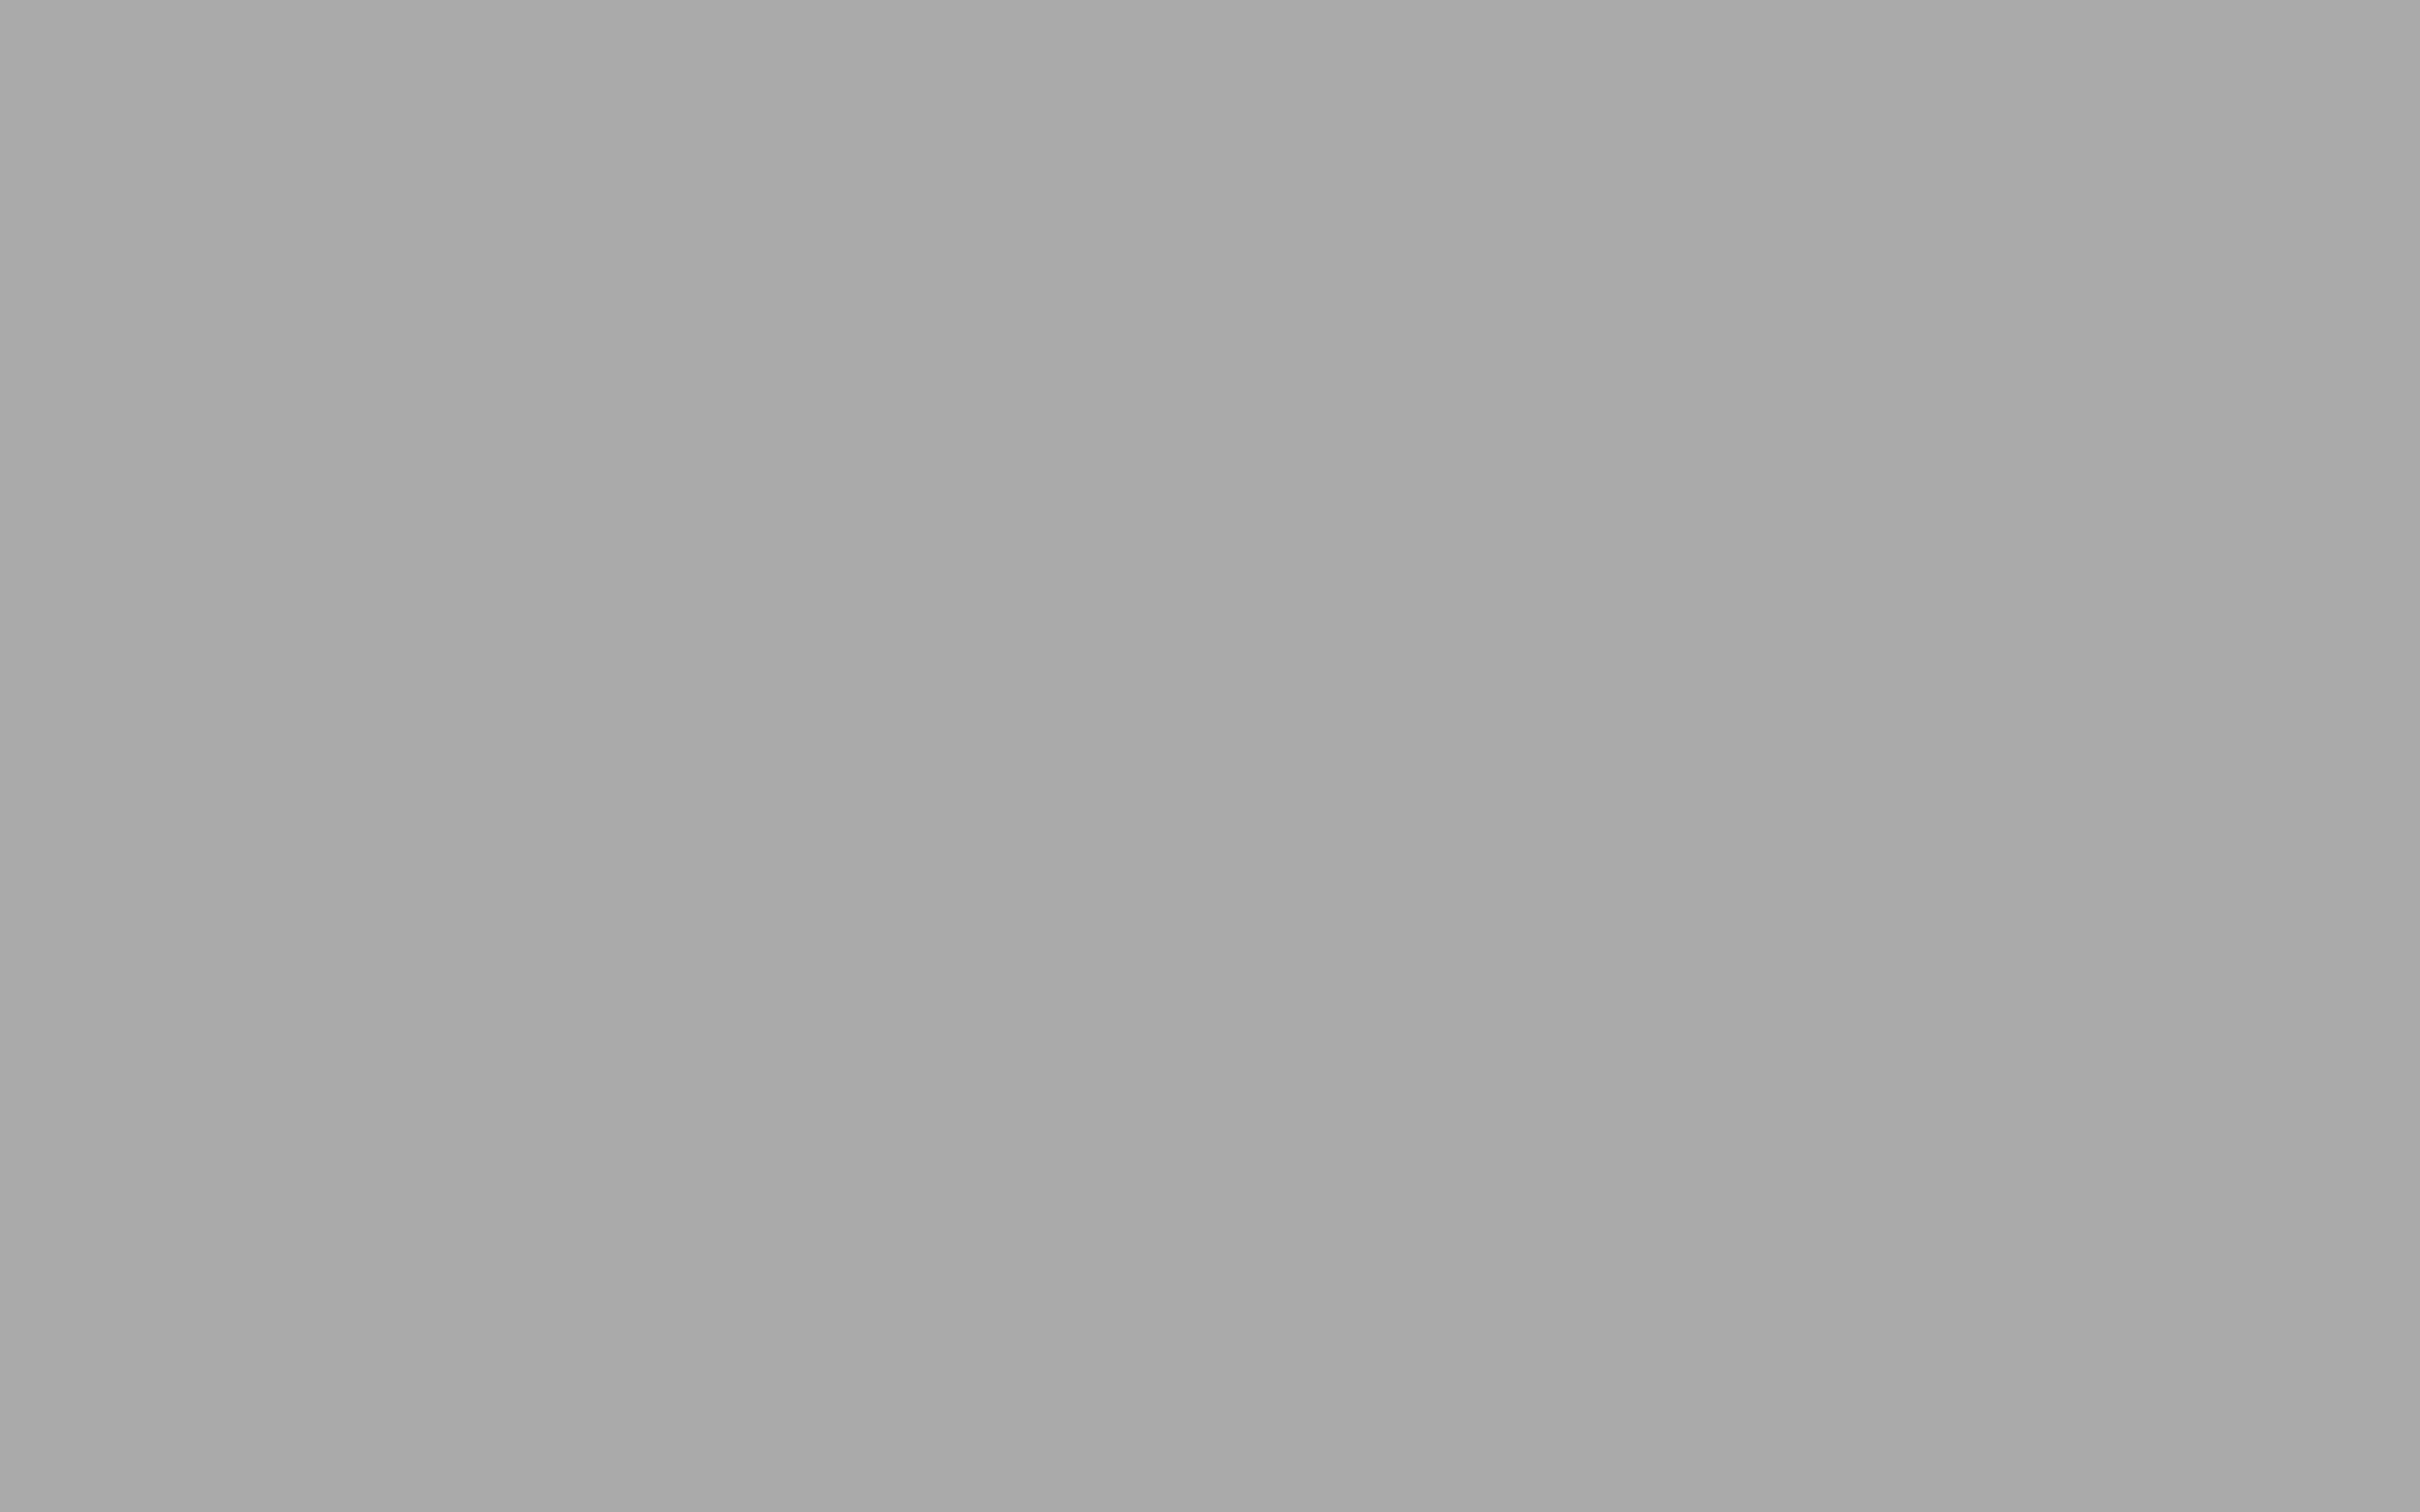 solid gray wallpaper wallpapersafari. Black Bedroom Furniture Sets. Home Design Ideas